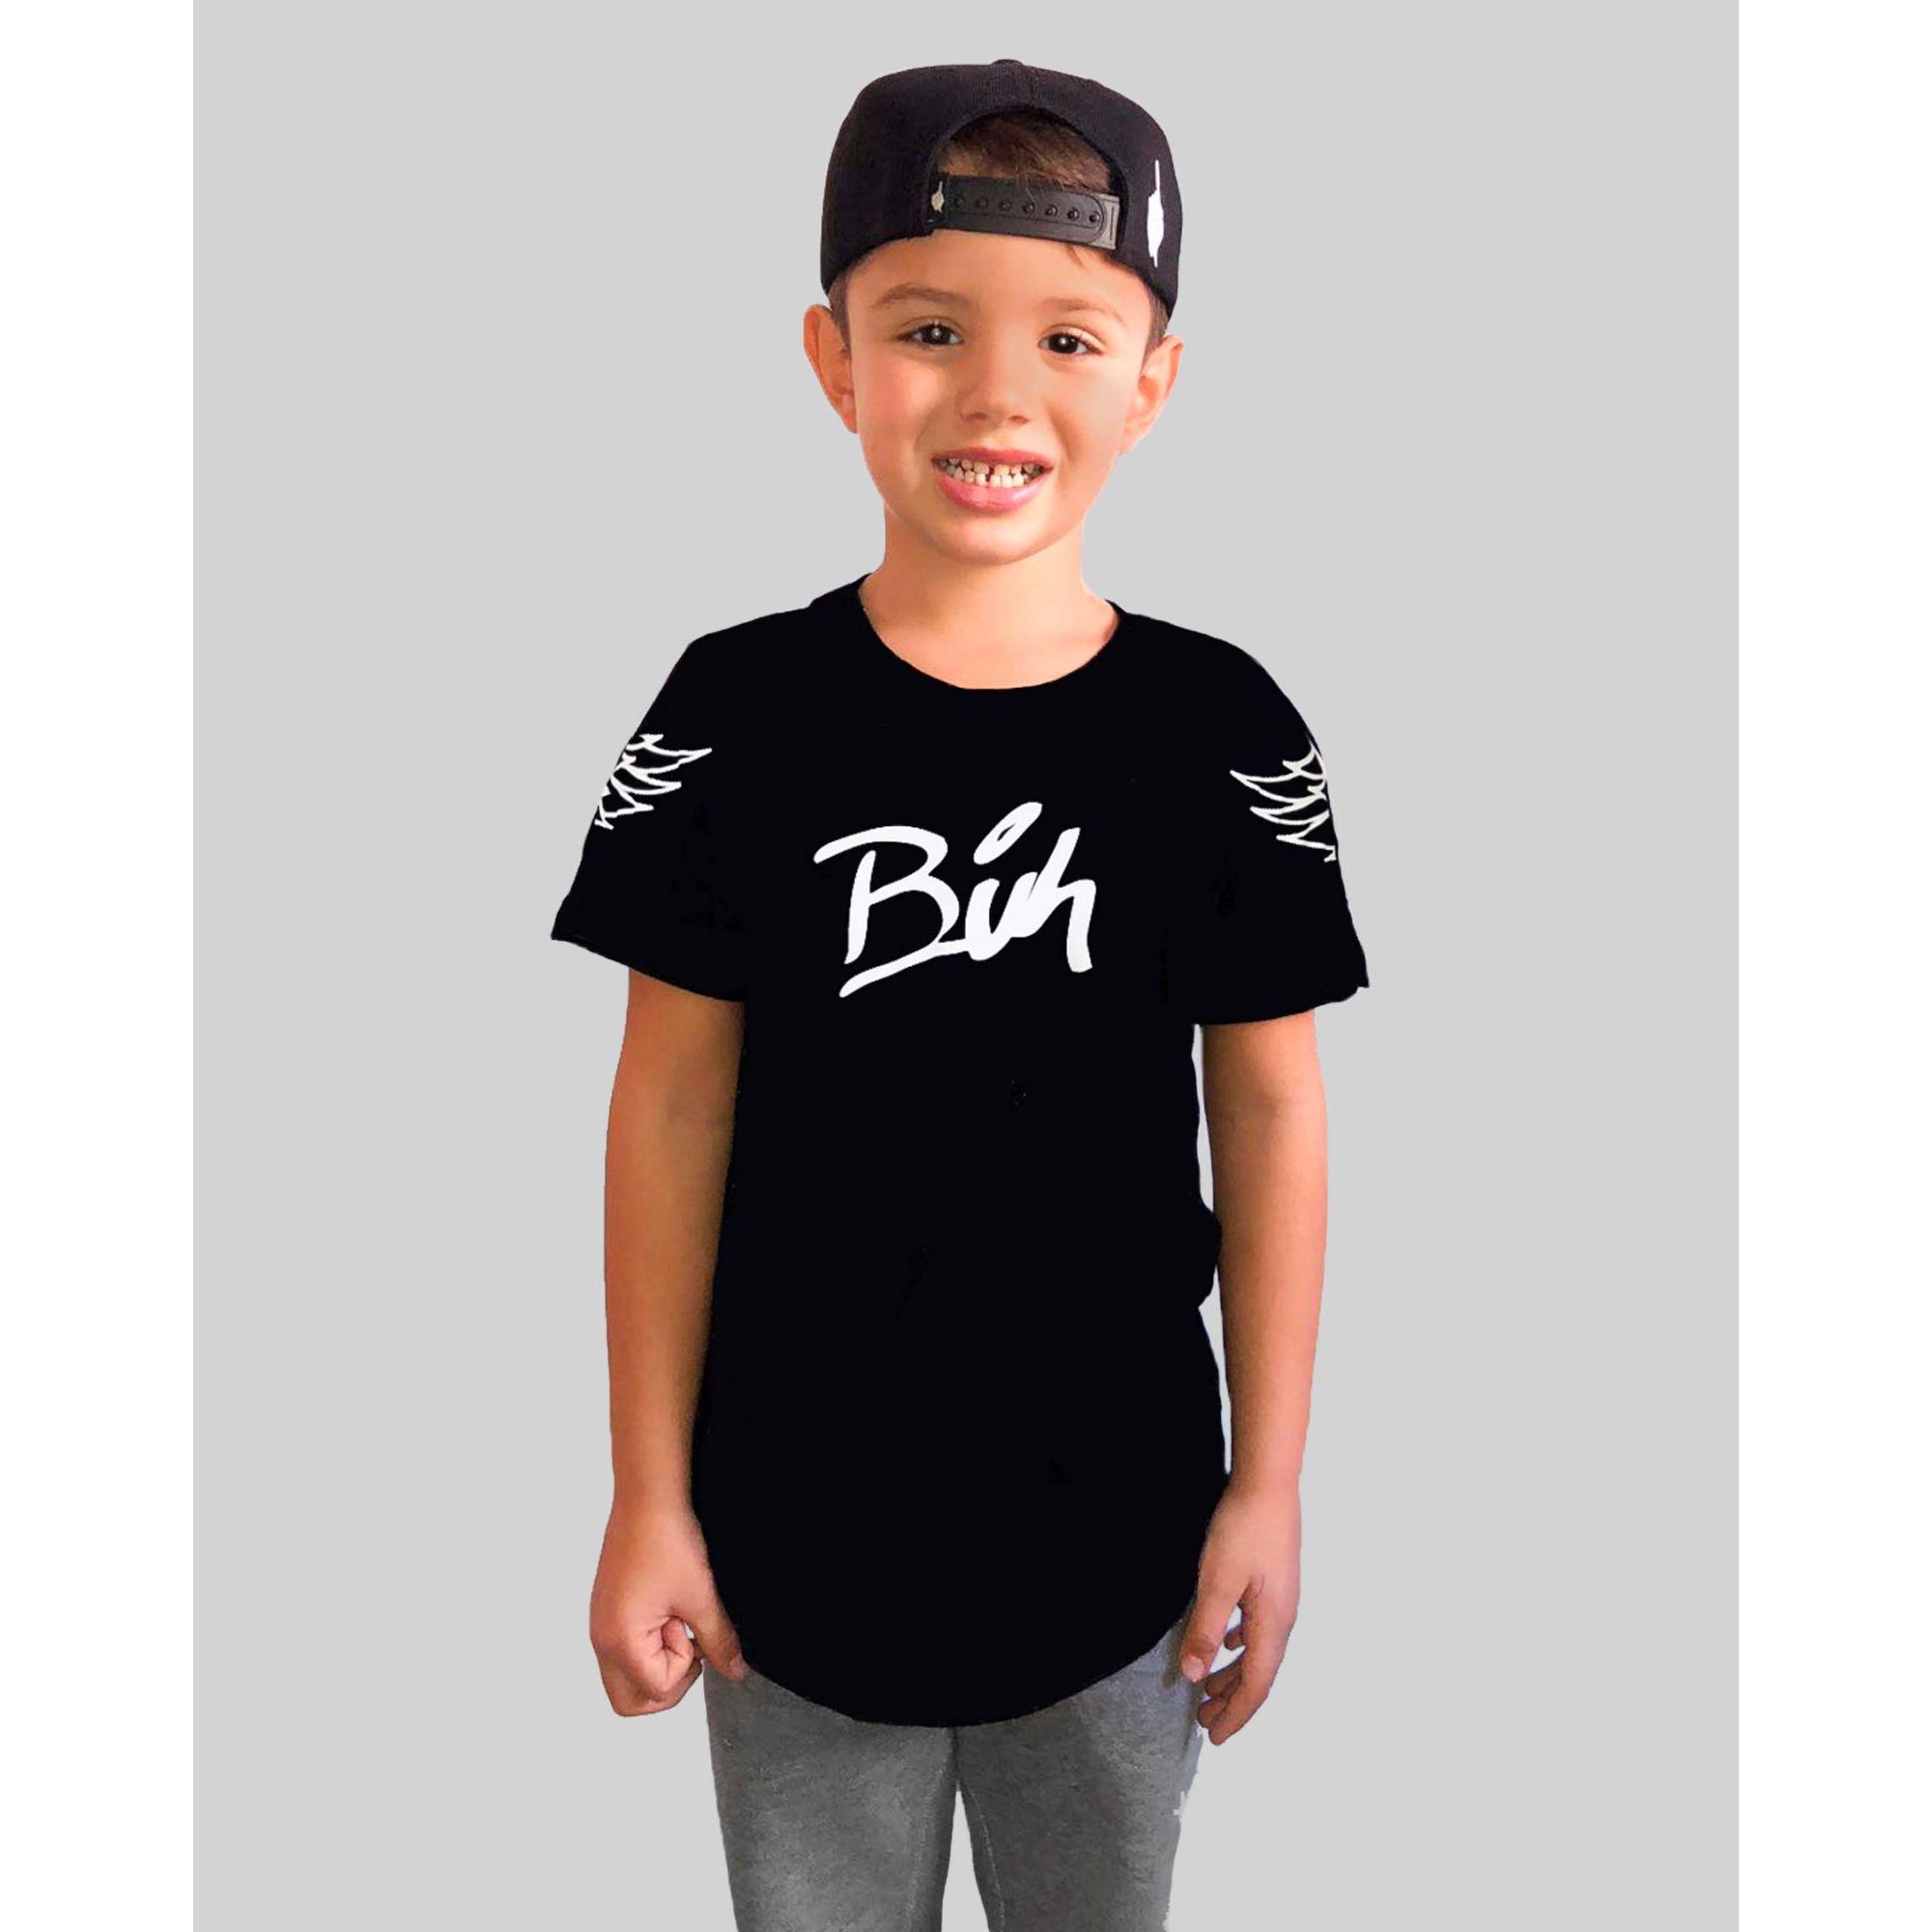 Camiseta Buh Kids Wings Black